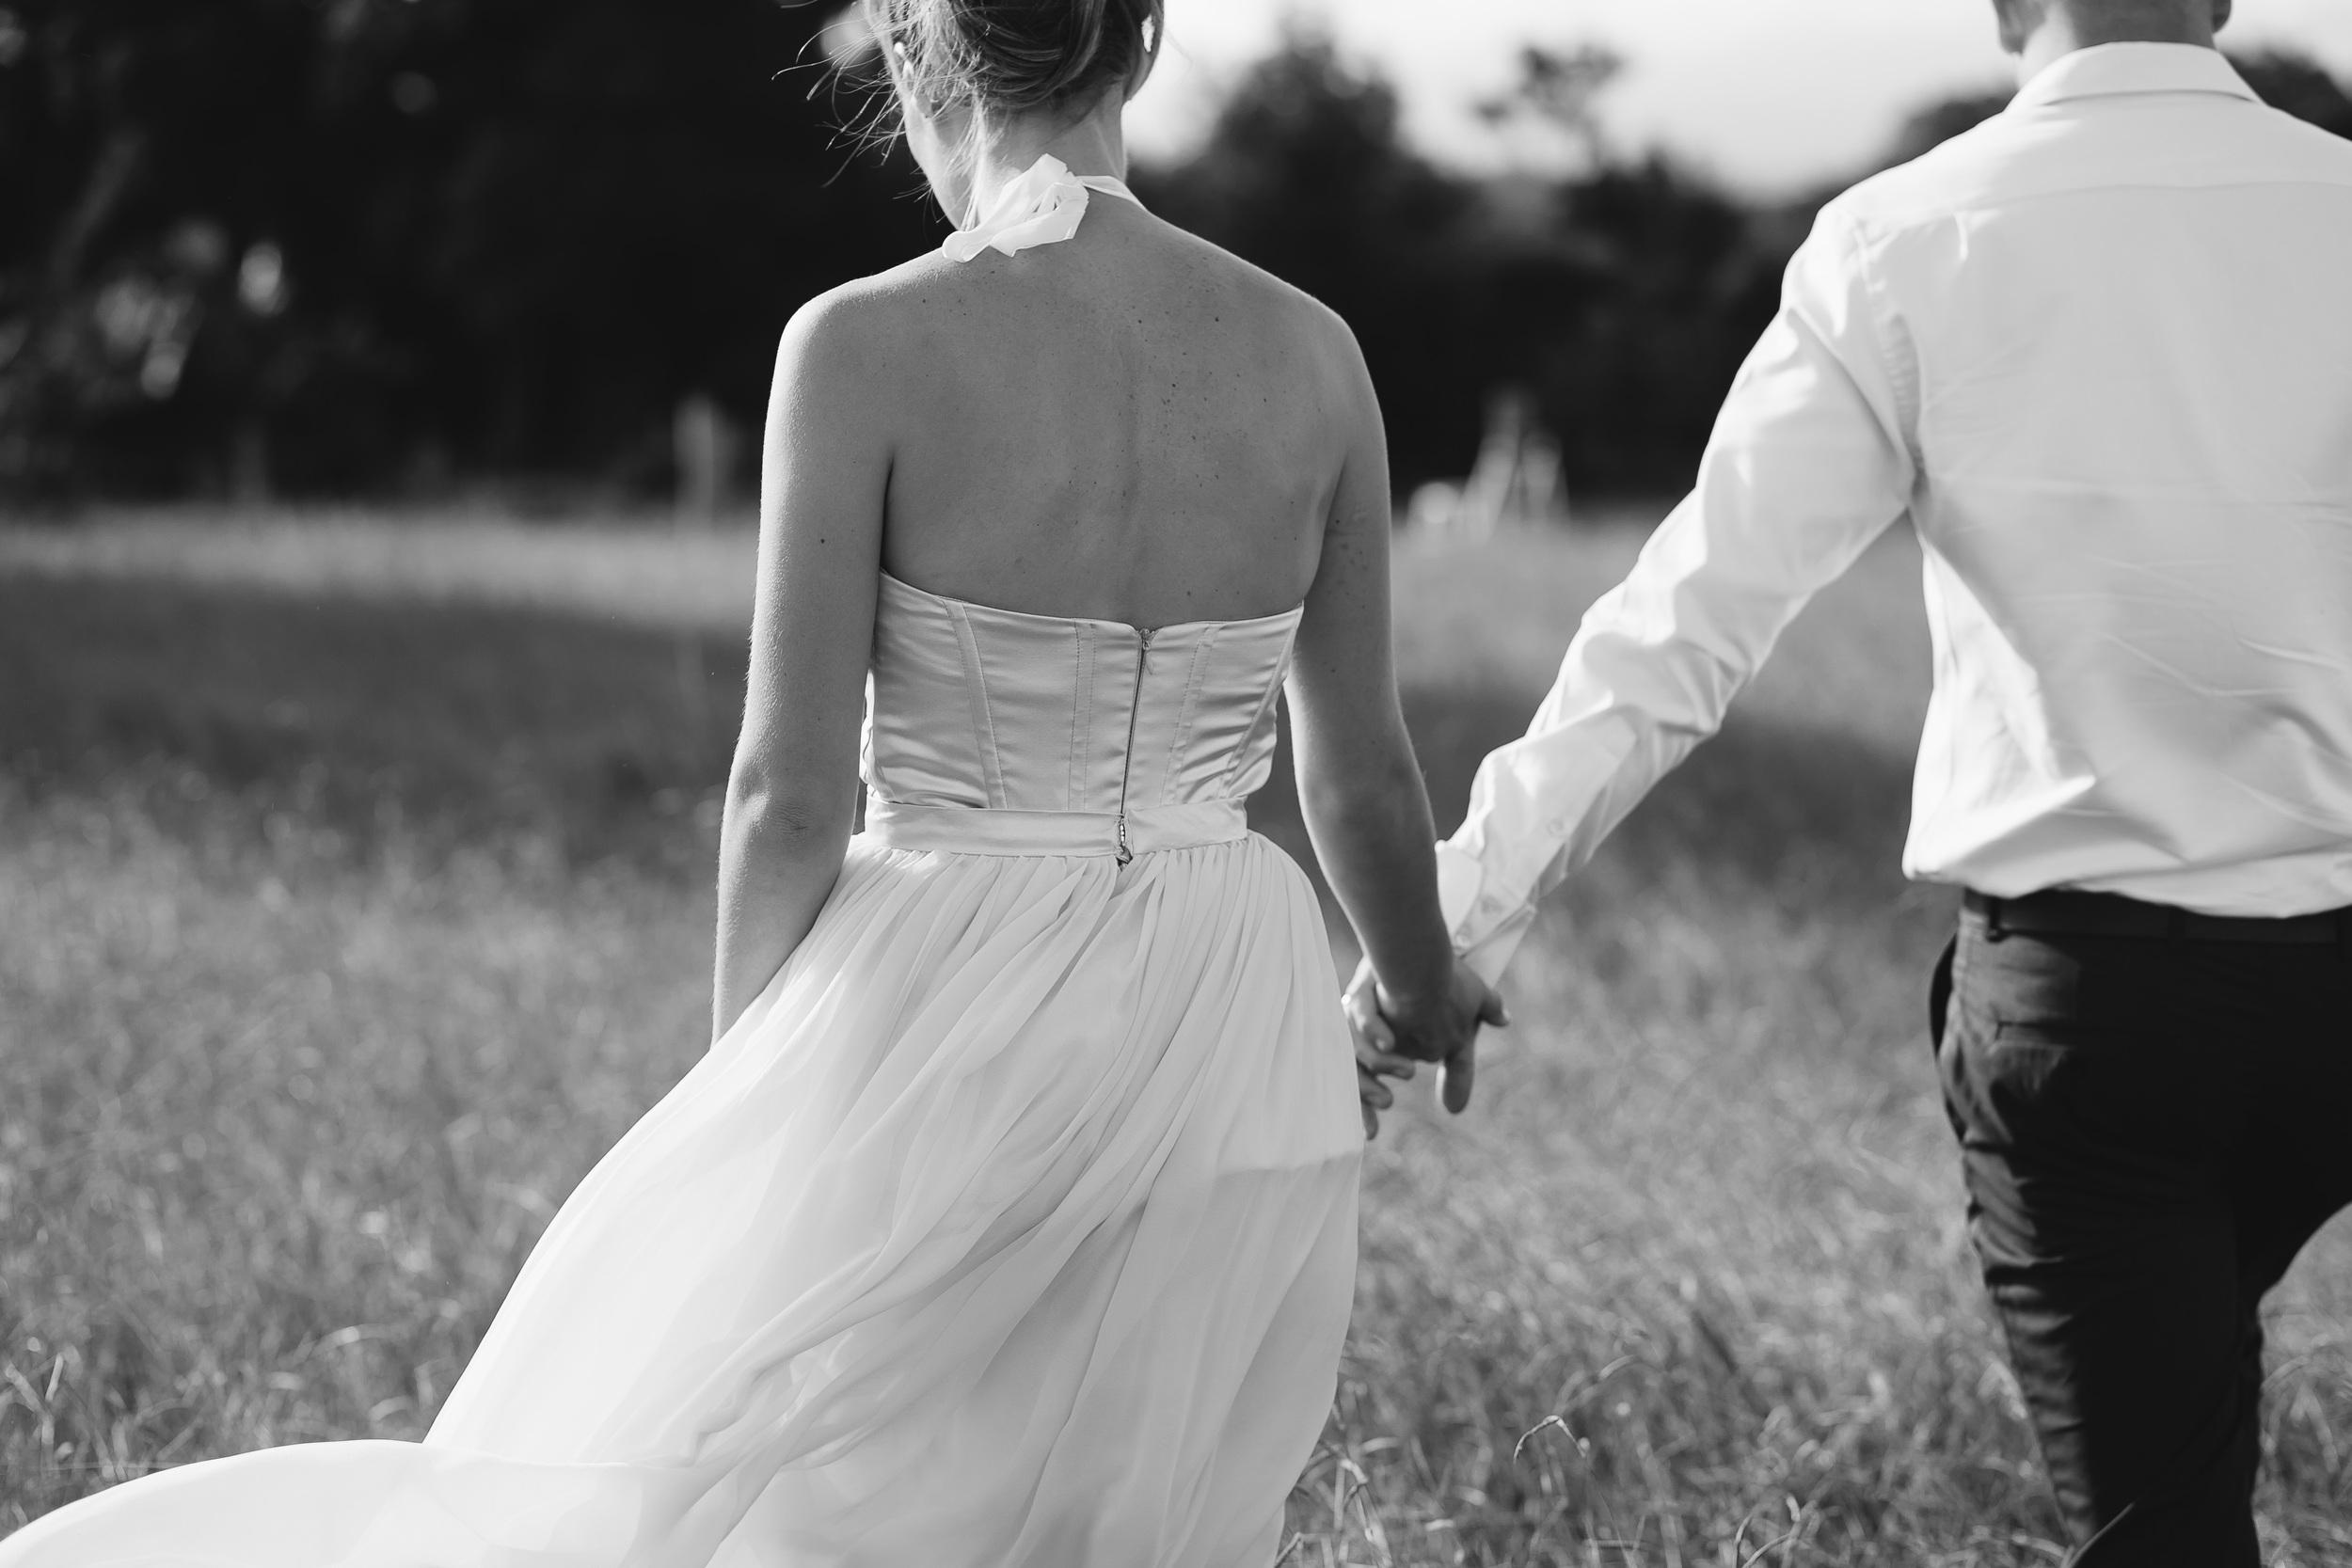 Byron Bay Wedding Harvest Cafe - Carly Tia Photography 030.jpg